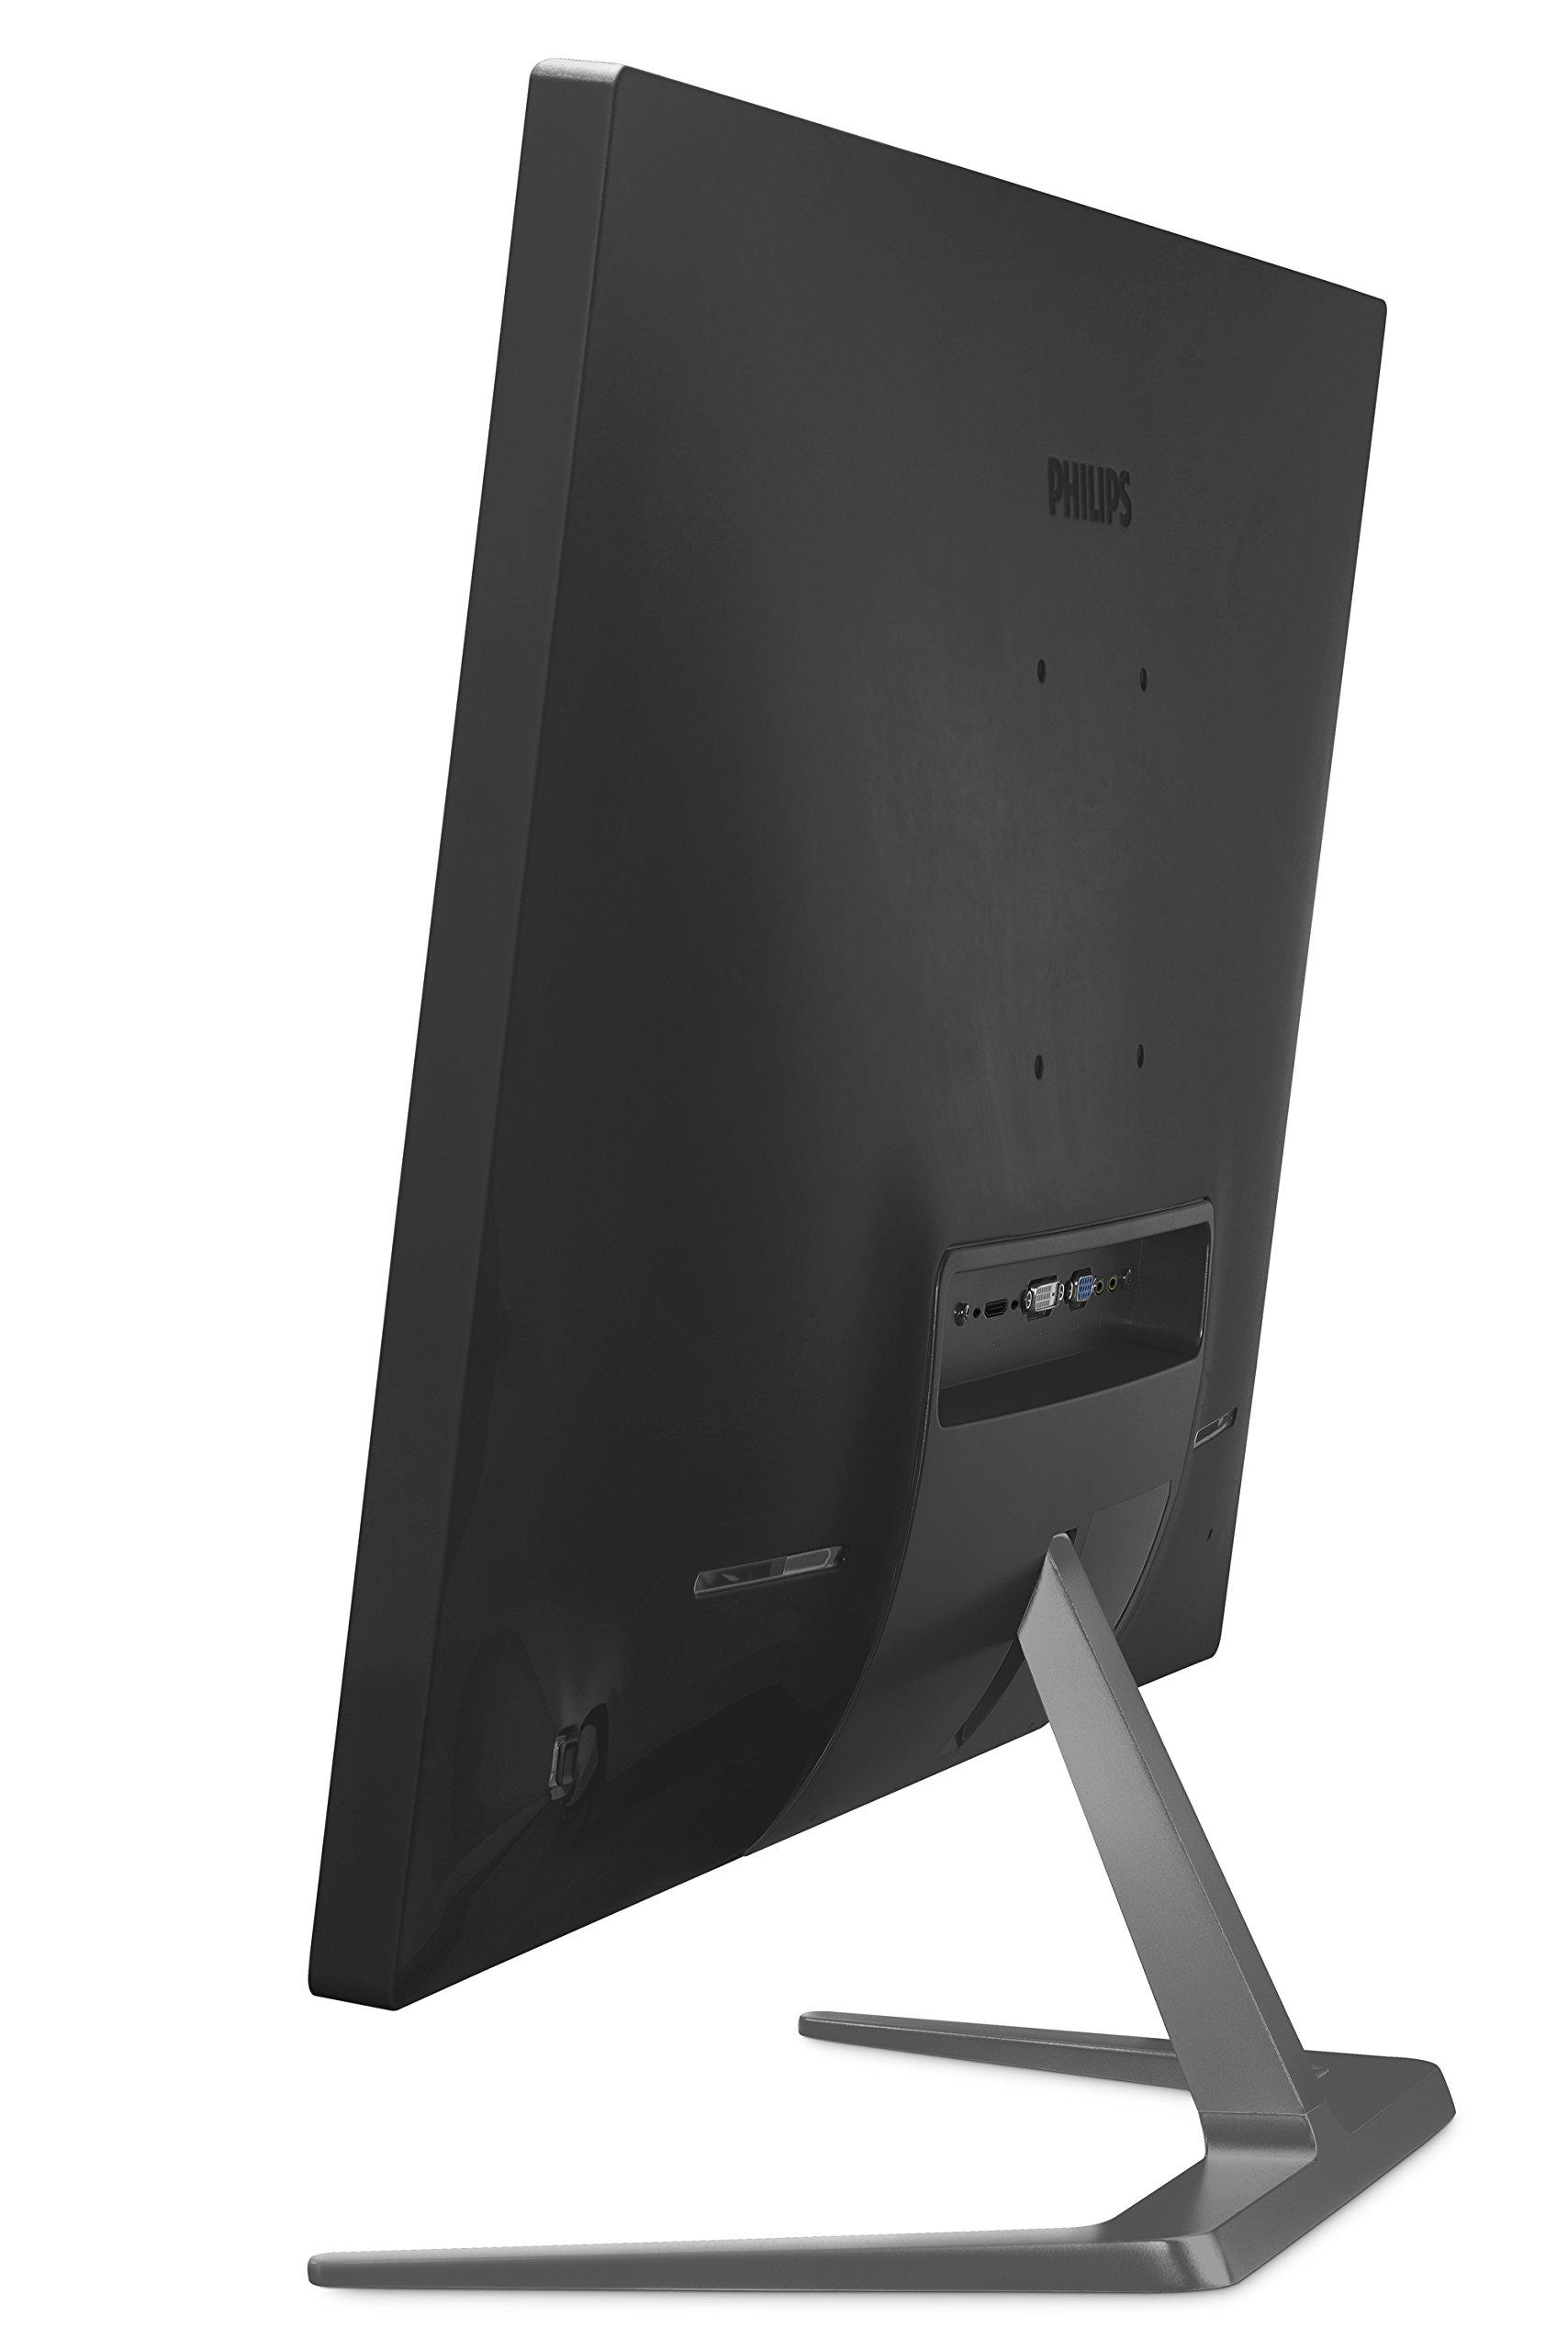 Philips 323e7qdab00 80 Cm 32 Zoll Monitor Vga Dvi Hdmi 1920 X